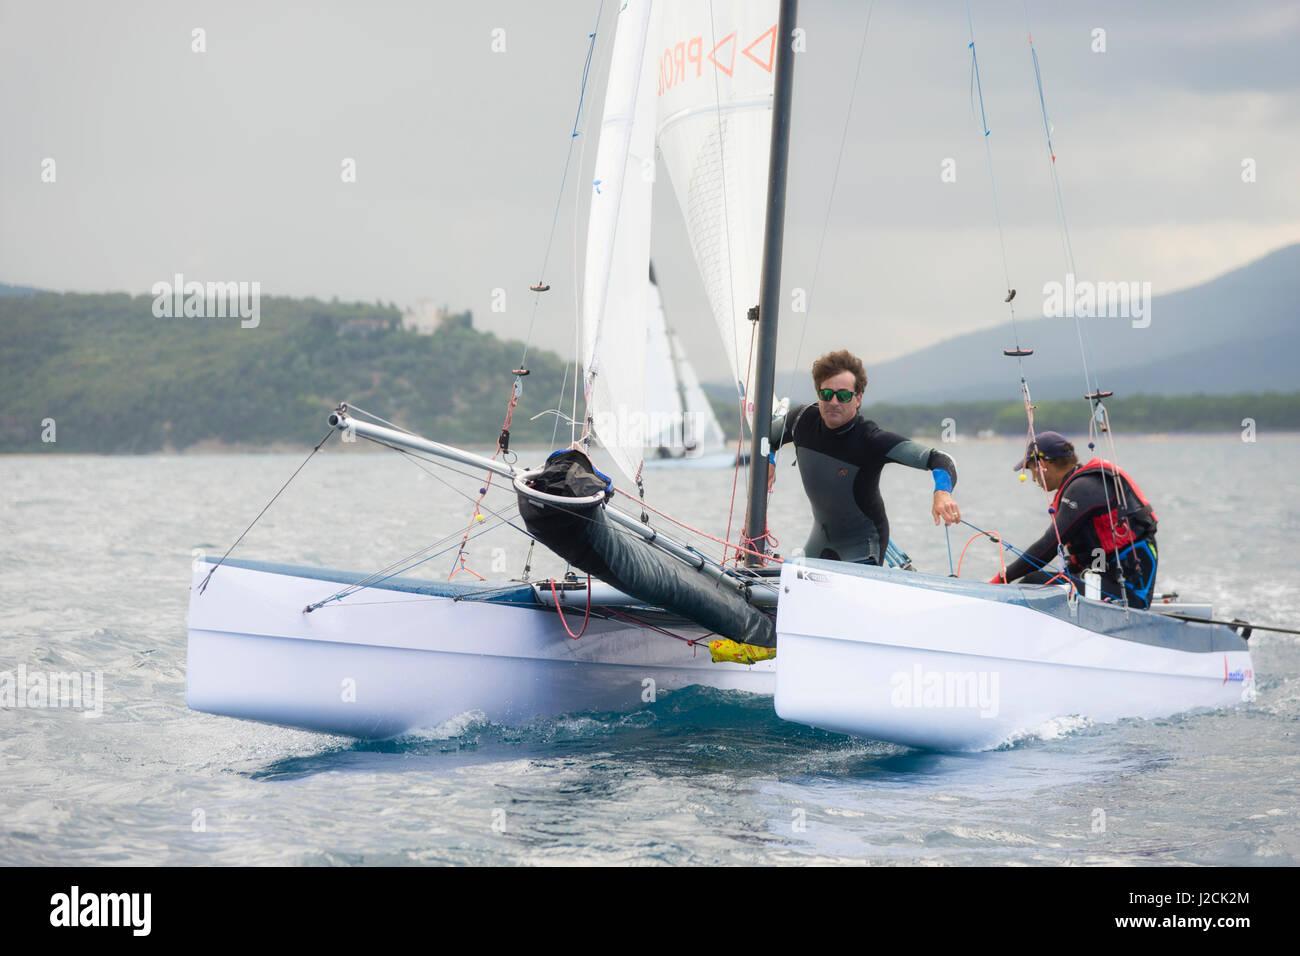 PUNTA ALA - 3 JUNE: teams sailing on Formula 18 national catamaran race, on June 3 2016 in Punta Ala, Italy - Stock Image